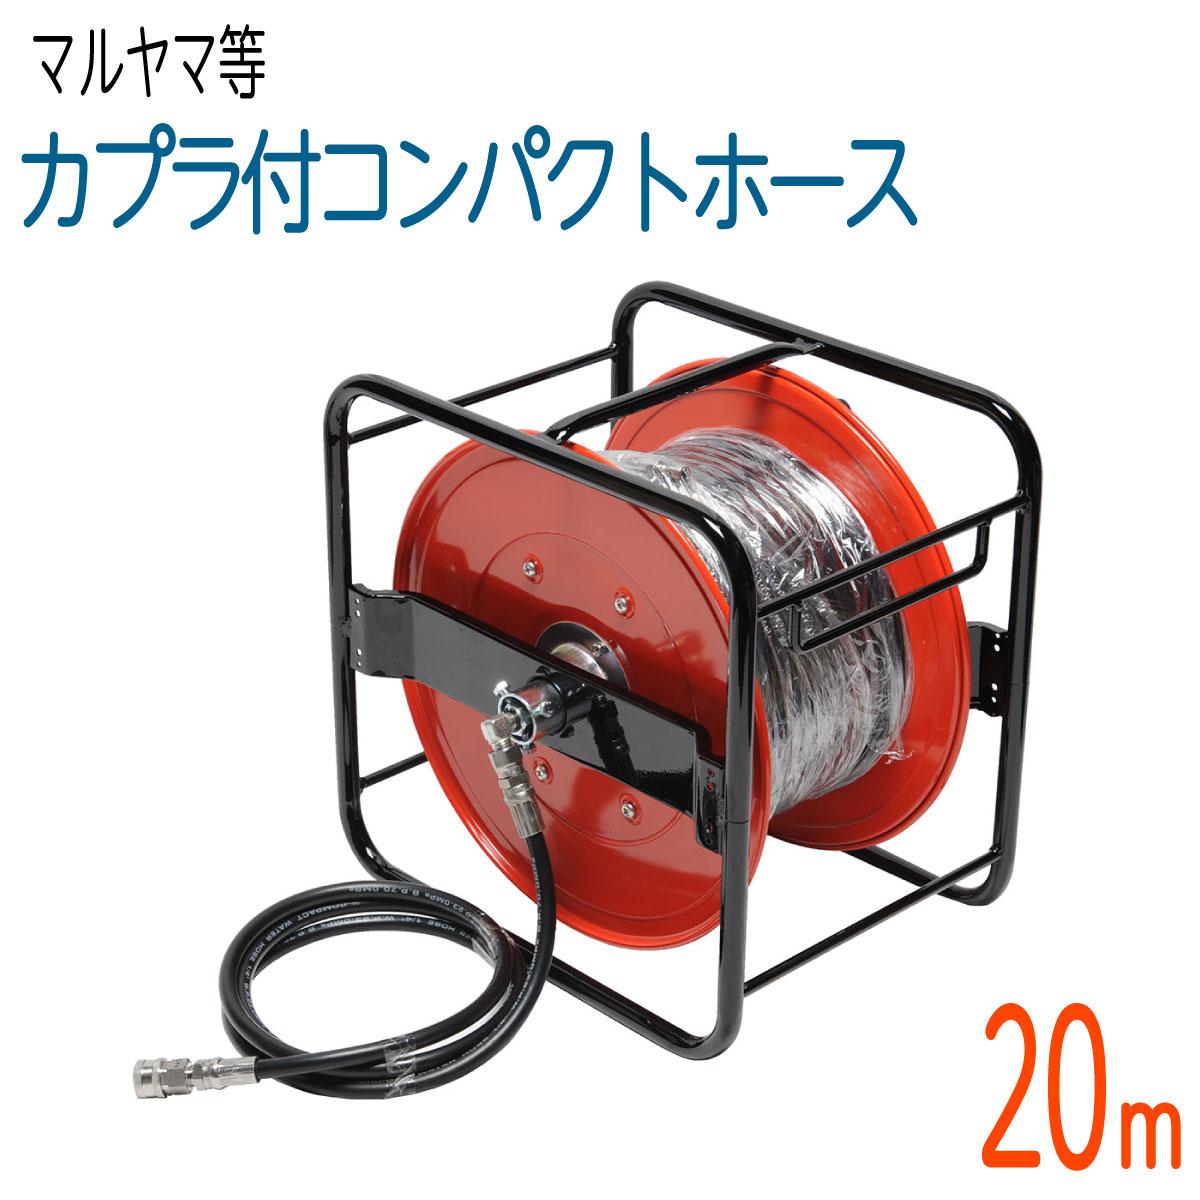 【20Mリール巻き】 1/4(2分) ワンタッチカプラ付 高圧洗浄機ホース コンパクトホース